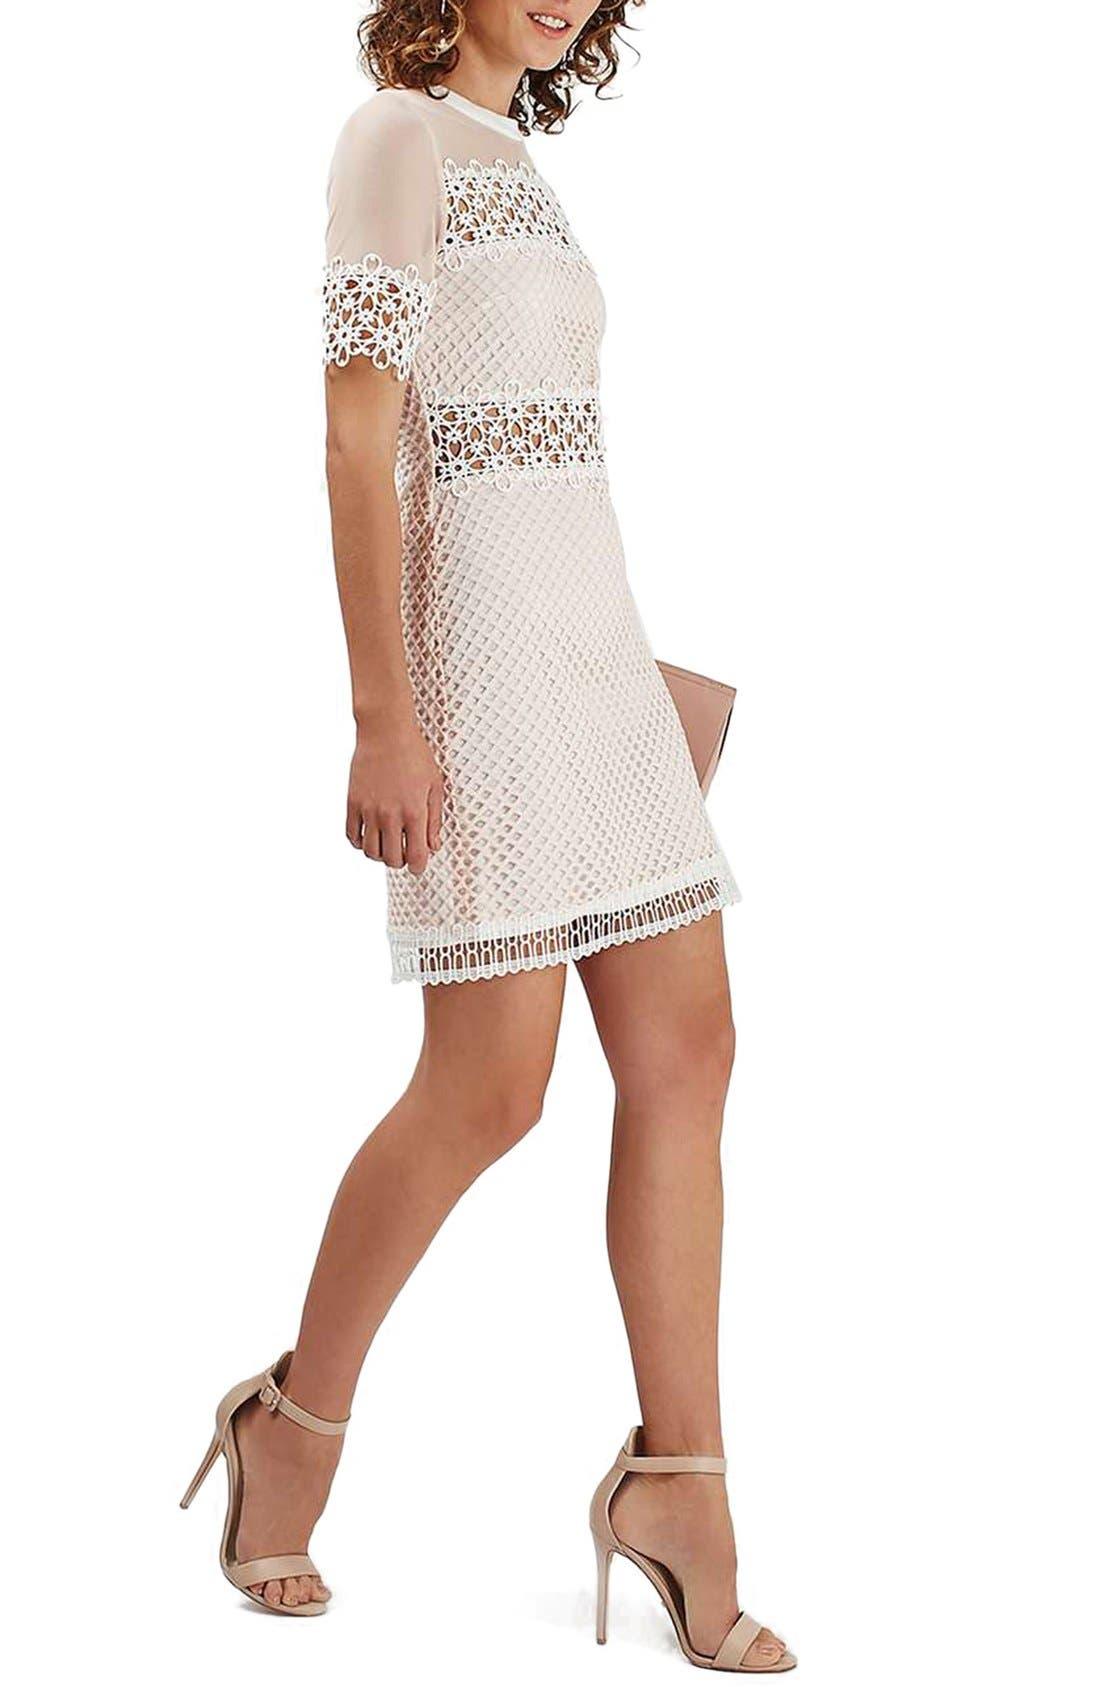 Alternate Image 1 Selected - Topshop Mesh & Lace A-Line Dress